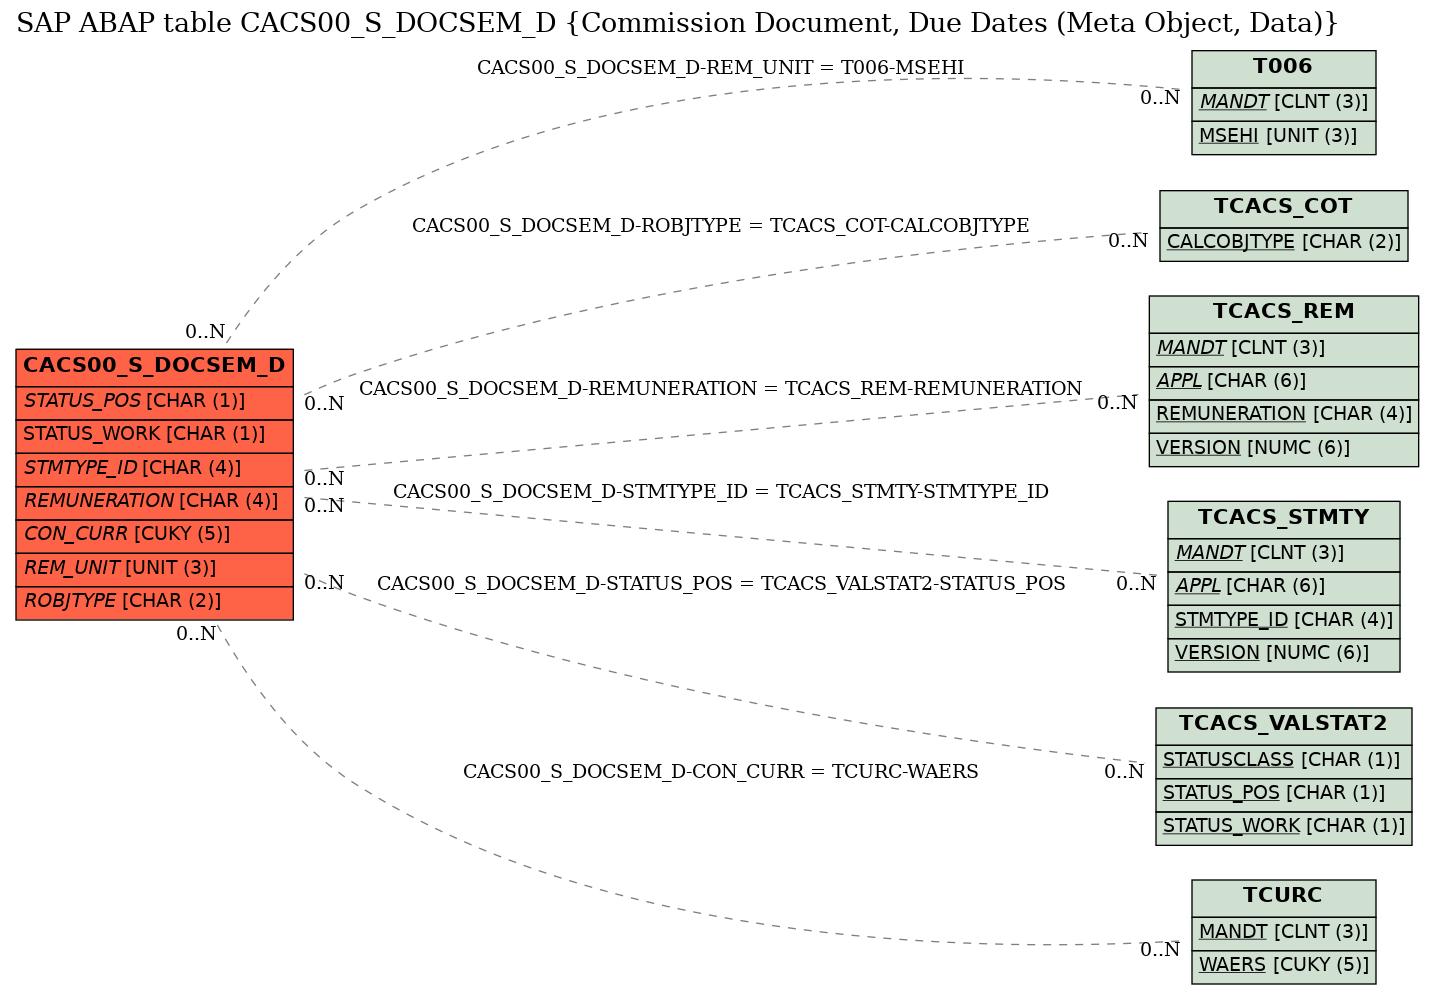 E-R Diagram for table CACS00_S_DOCSEM_D (Commission Document, Due Dates (Meta Object, Data))